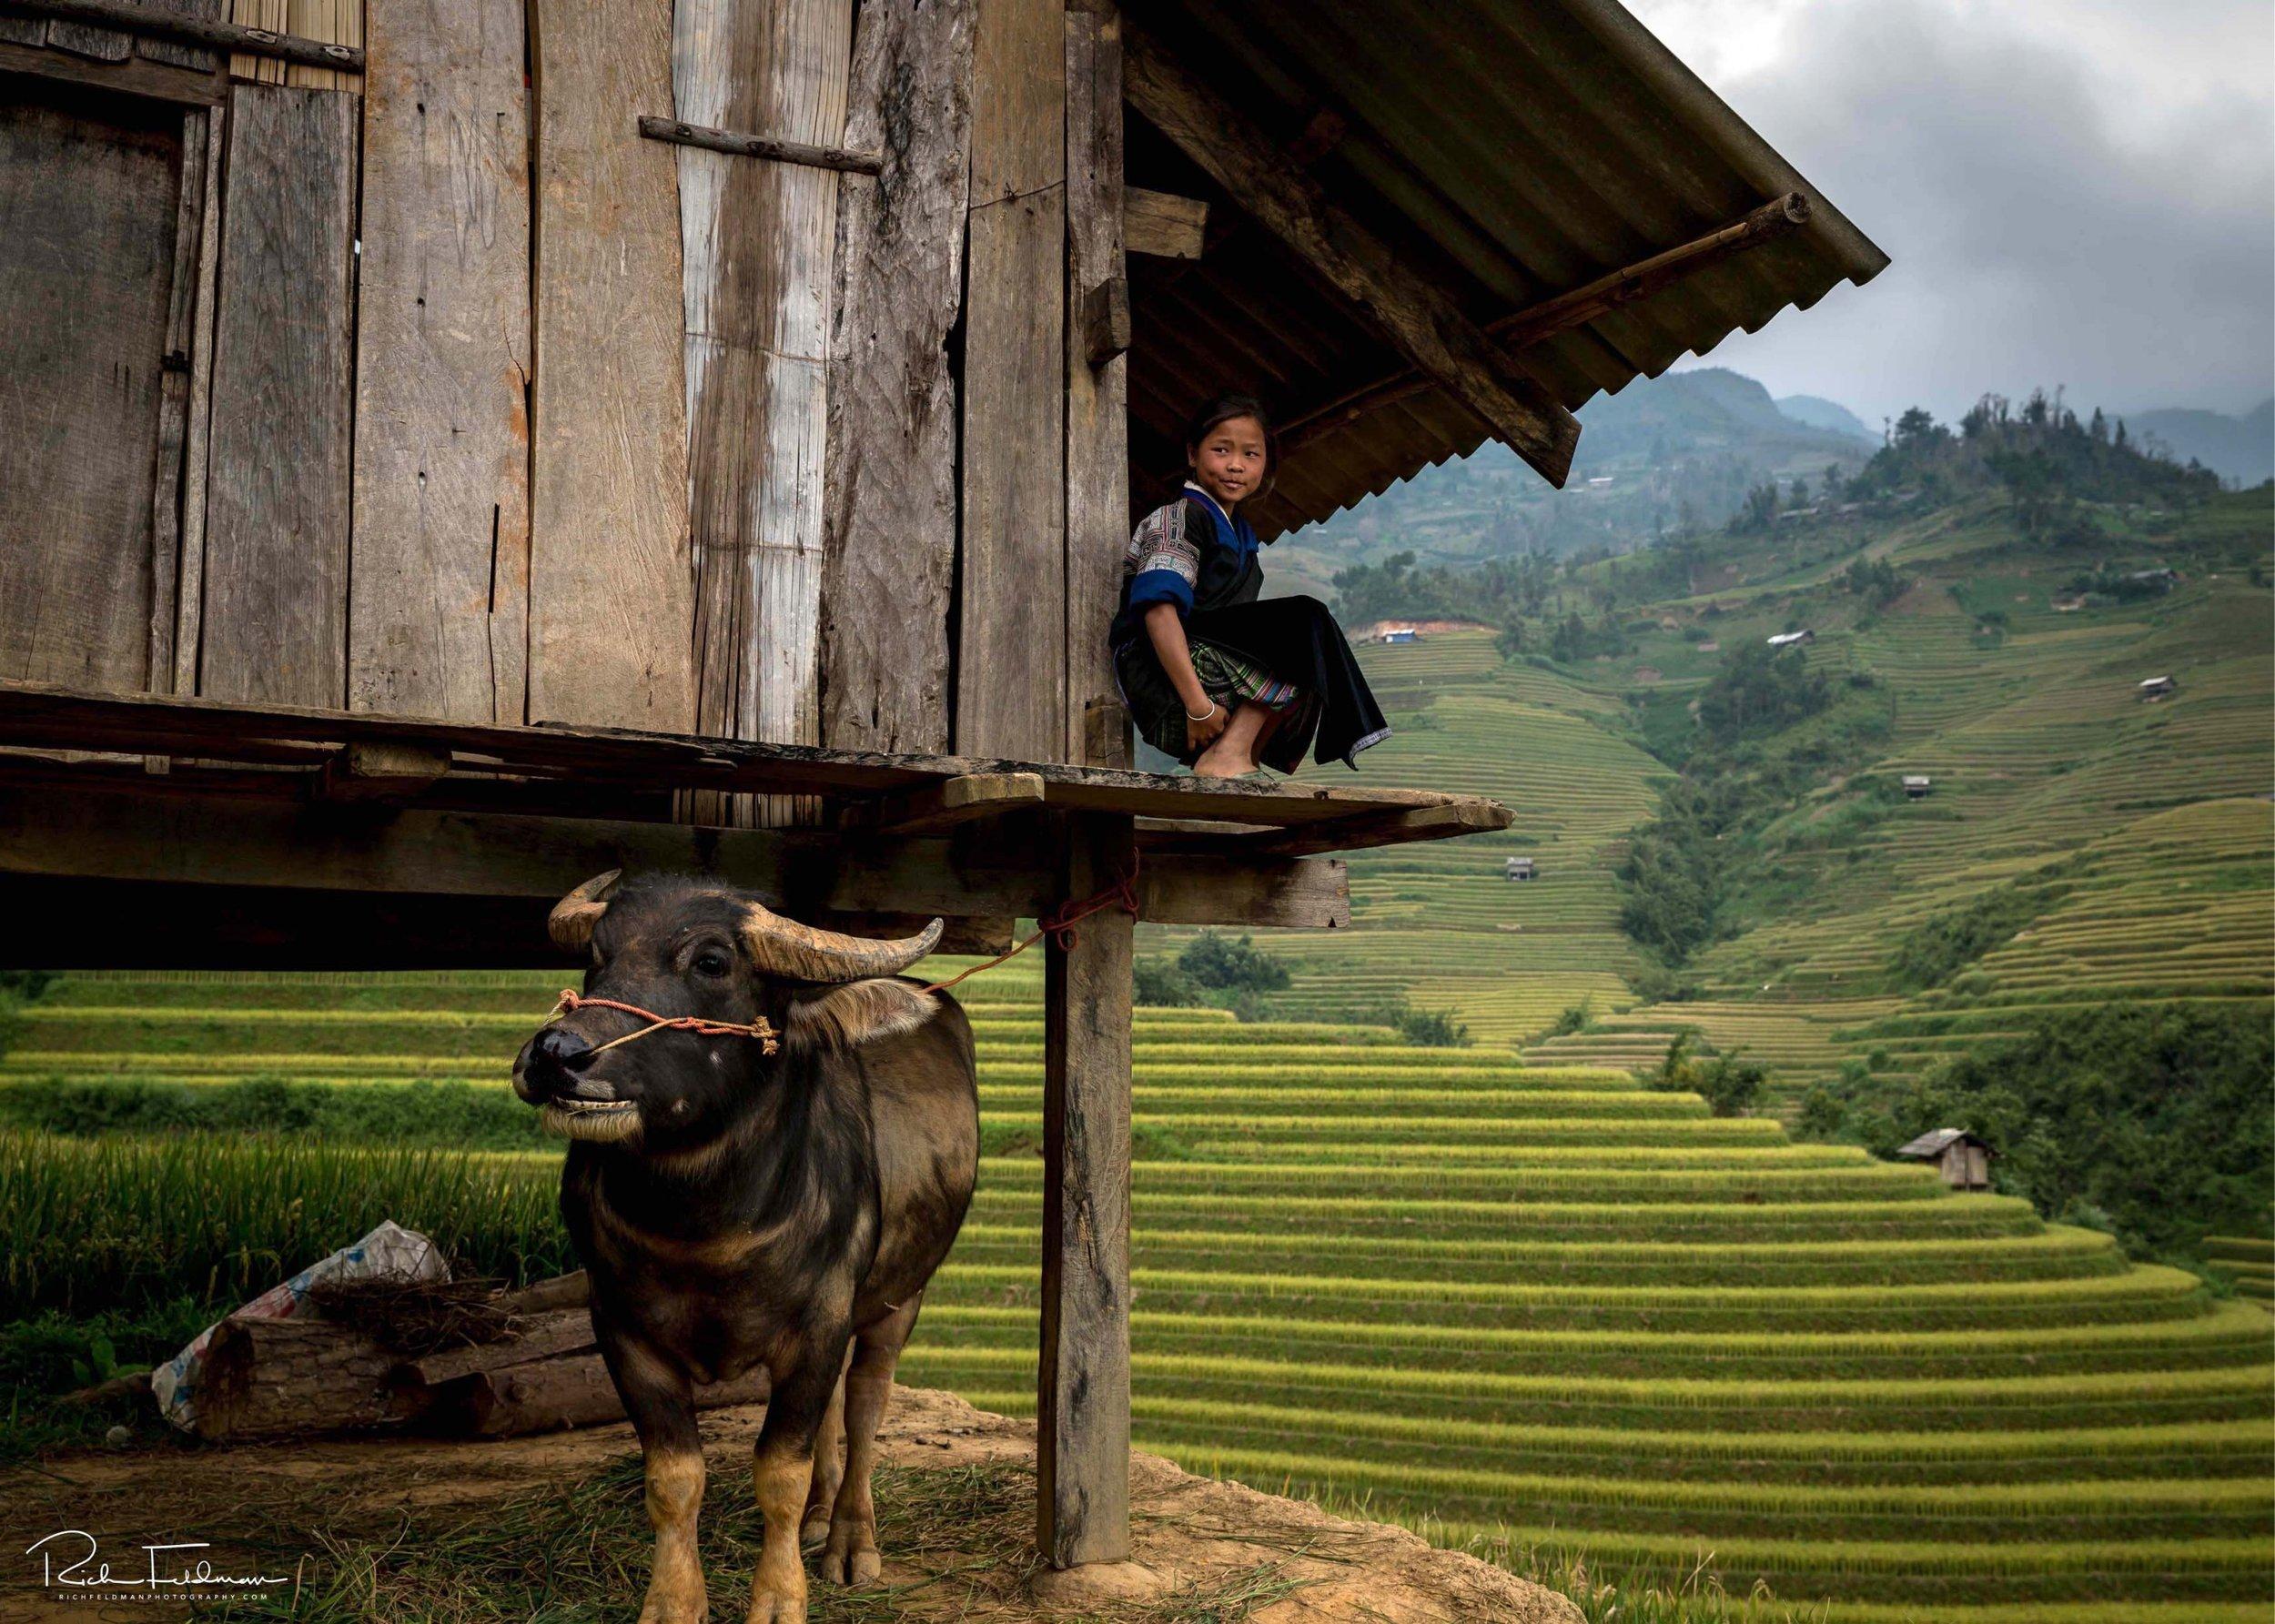 Vietnam-selects-13-2880x2056.jpg